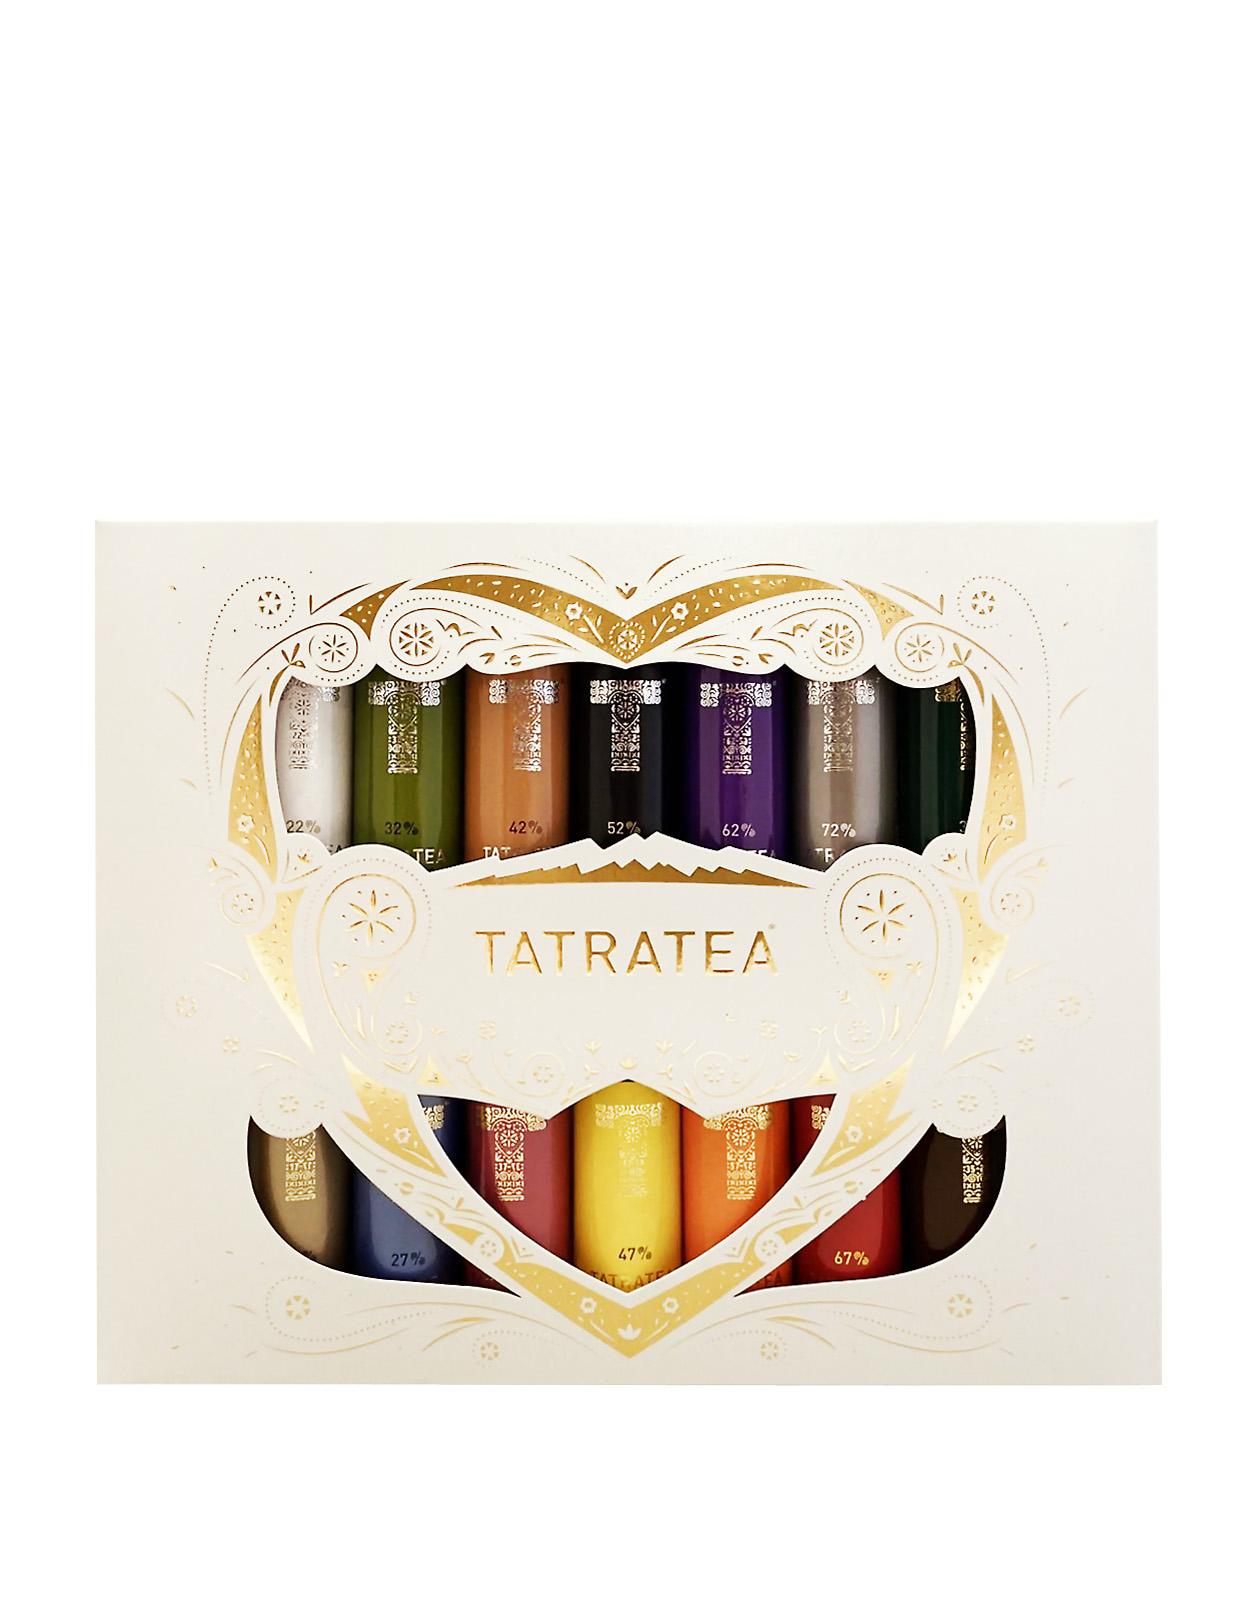 TATRATEA Mini Set 17-72% 14ks, Bottleshop Sunny wines slnecnice mesto, petrzalka, Tatratea, rozvoz alkoholu, eshop